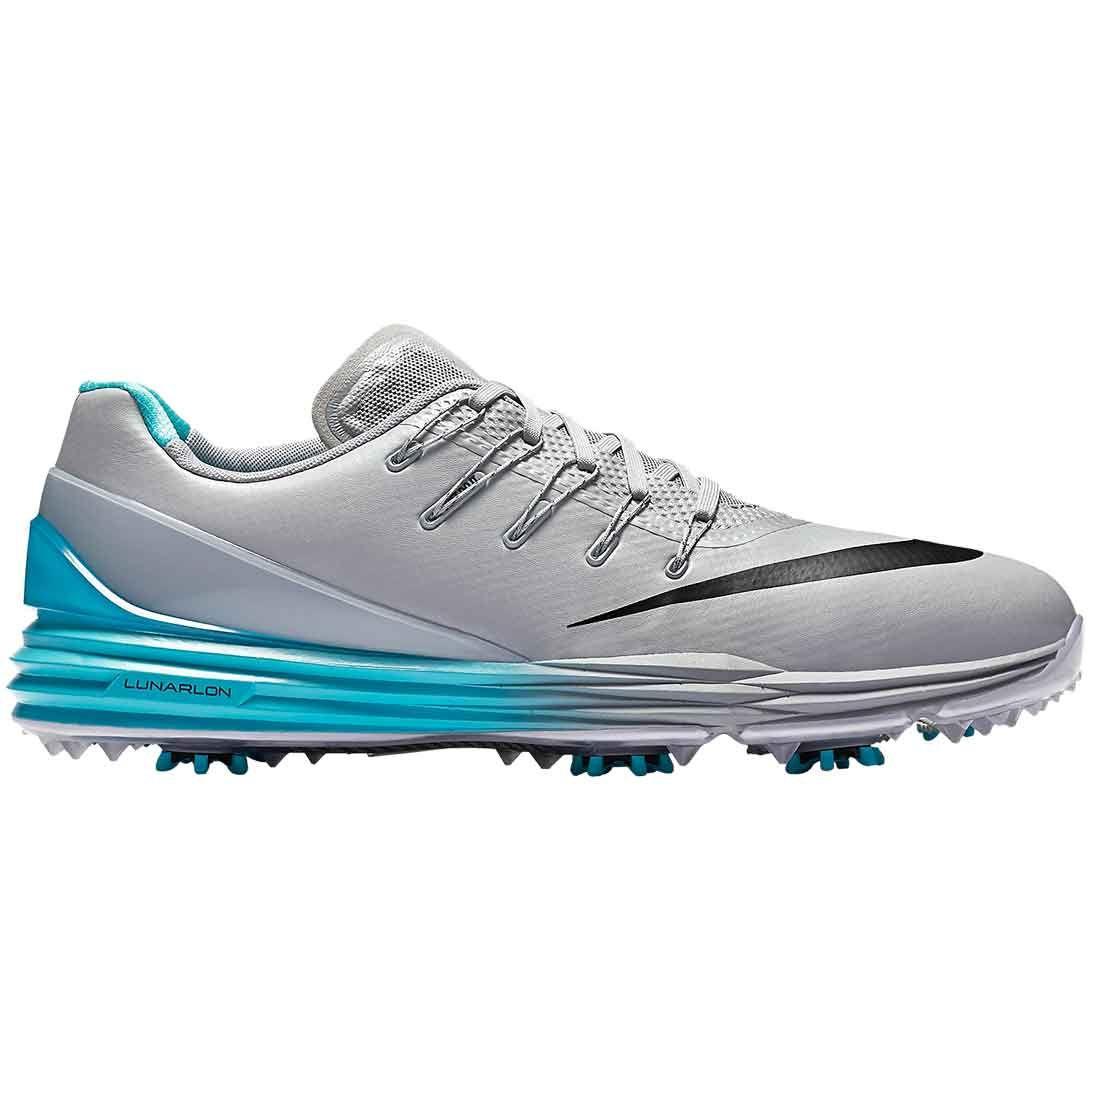 lunar control 4 golf shoes